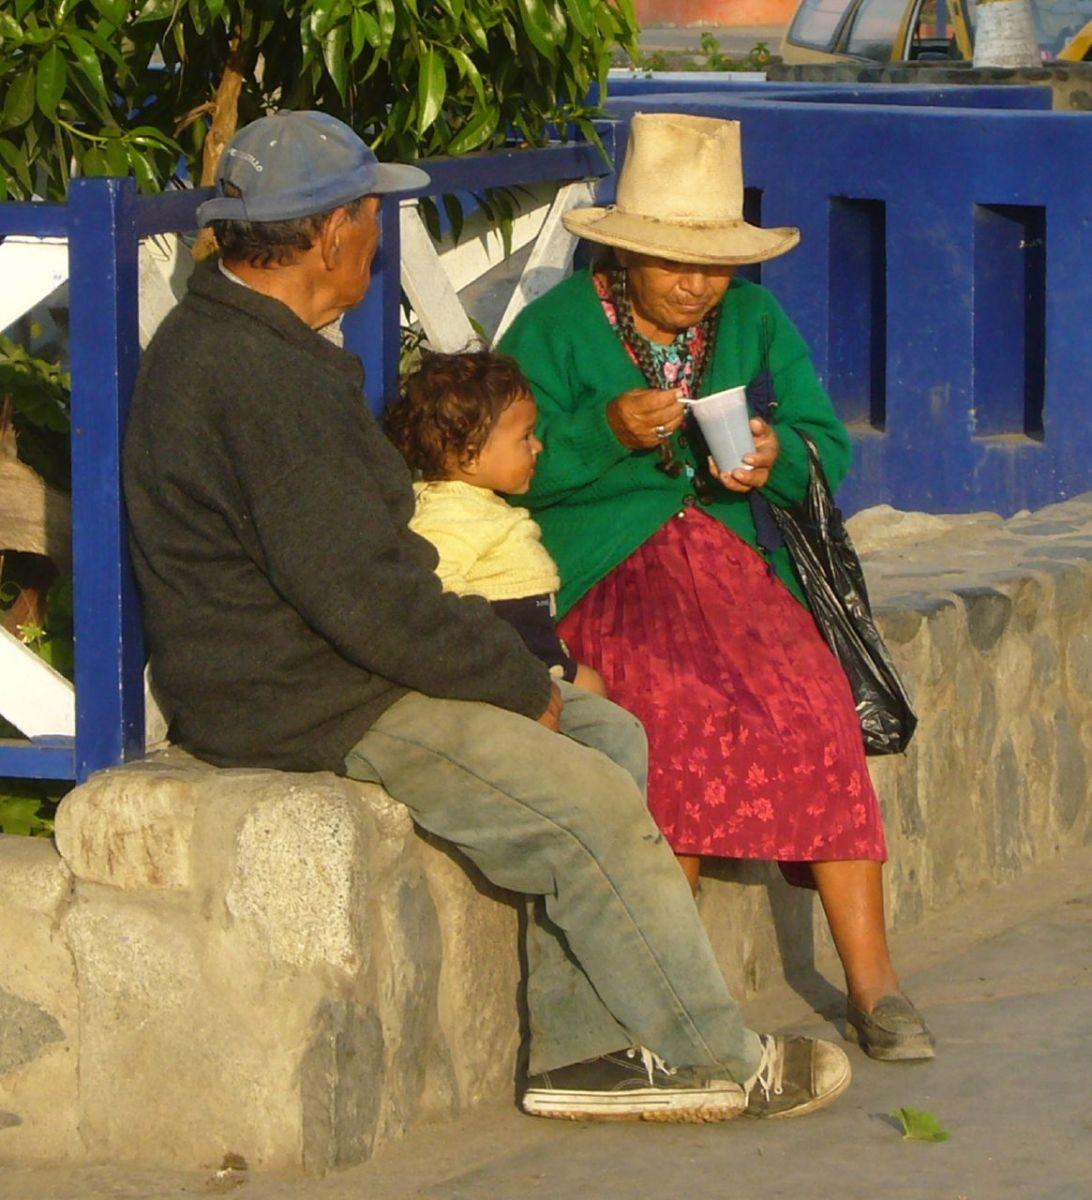 Caring grandparents